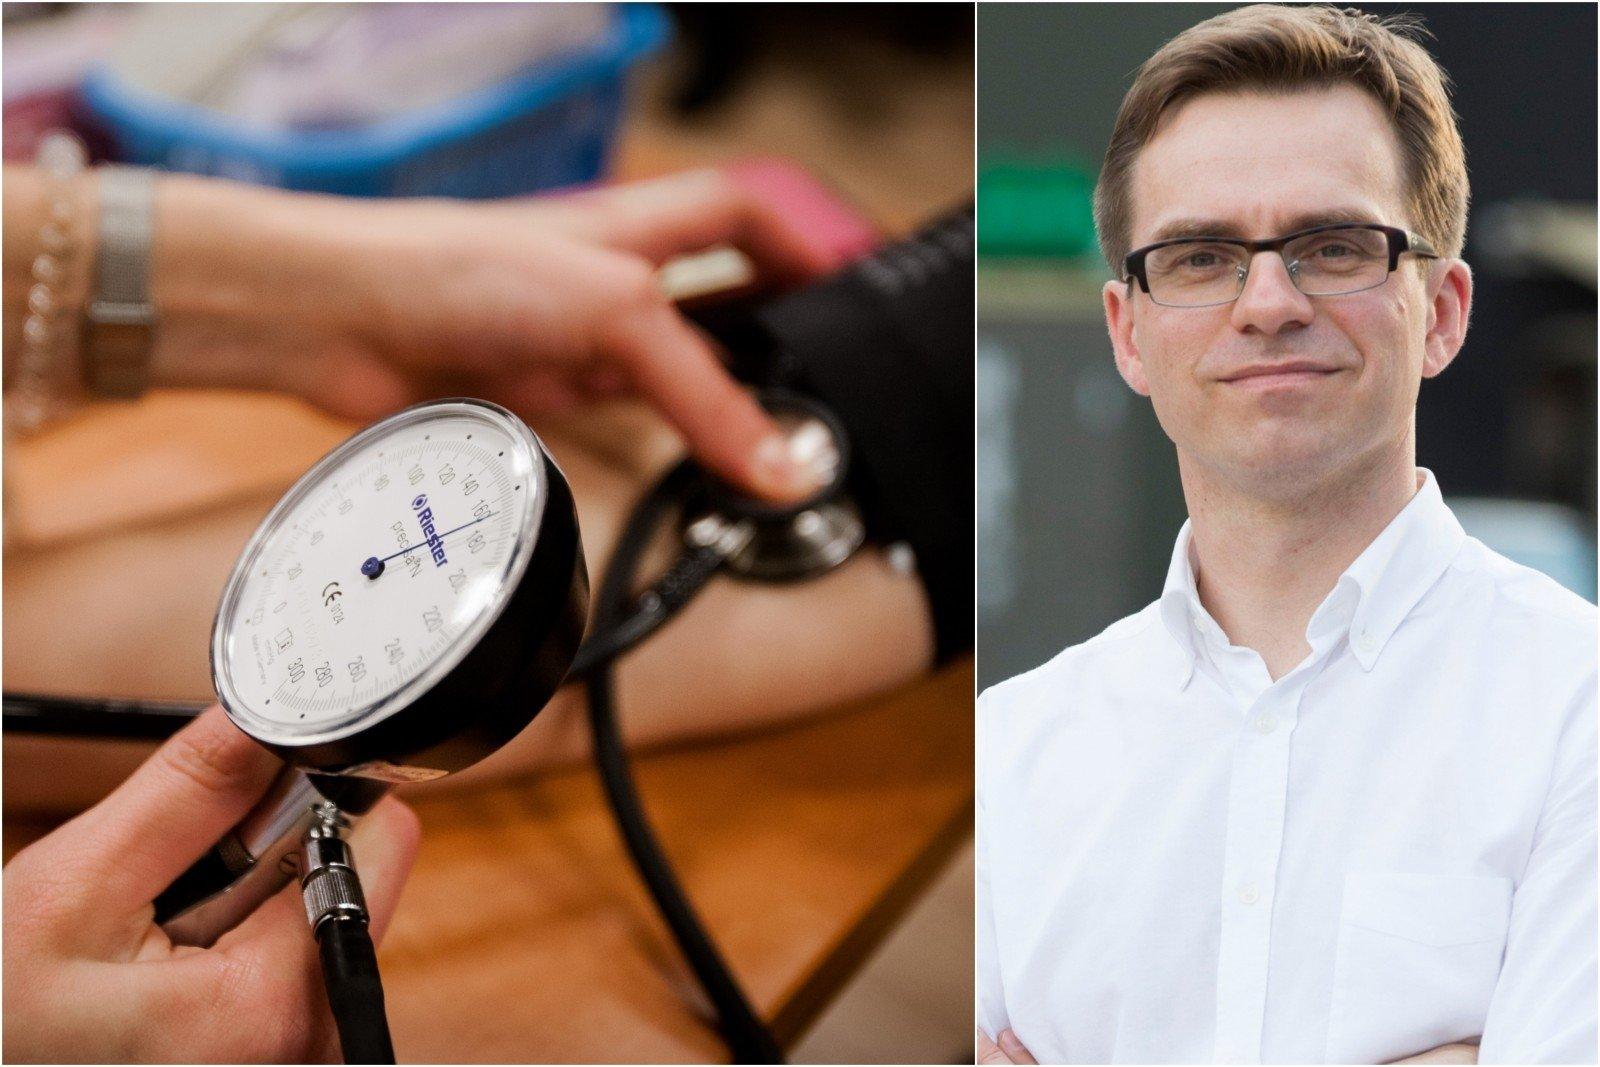 sergant hipertenzija, druska gali būti hipertenzija šiuolaikinė medicina